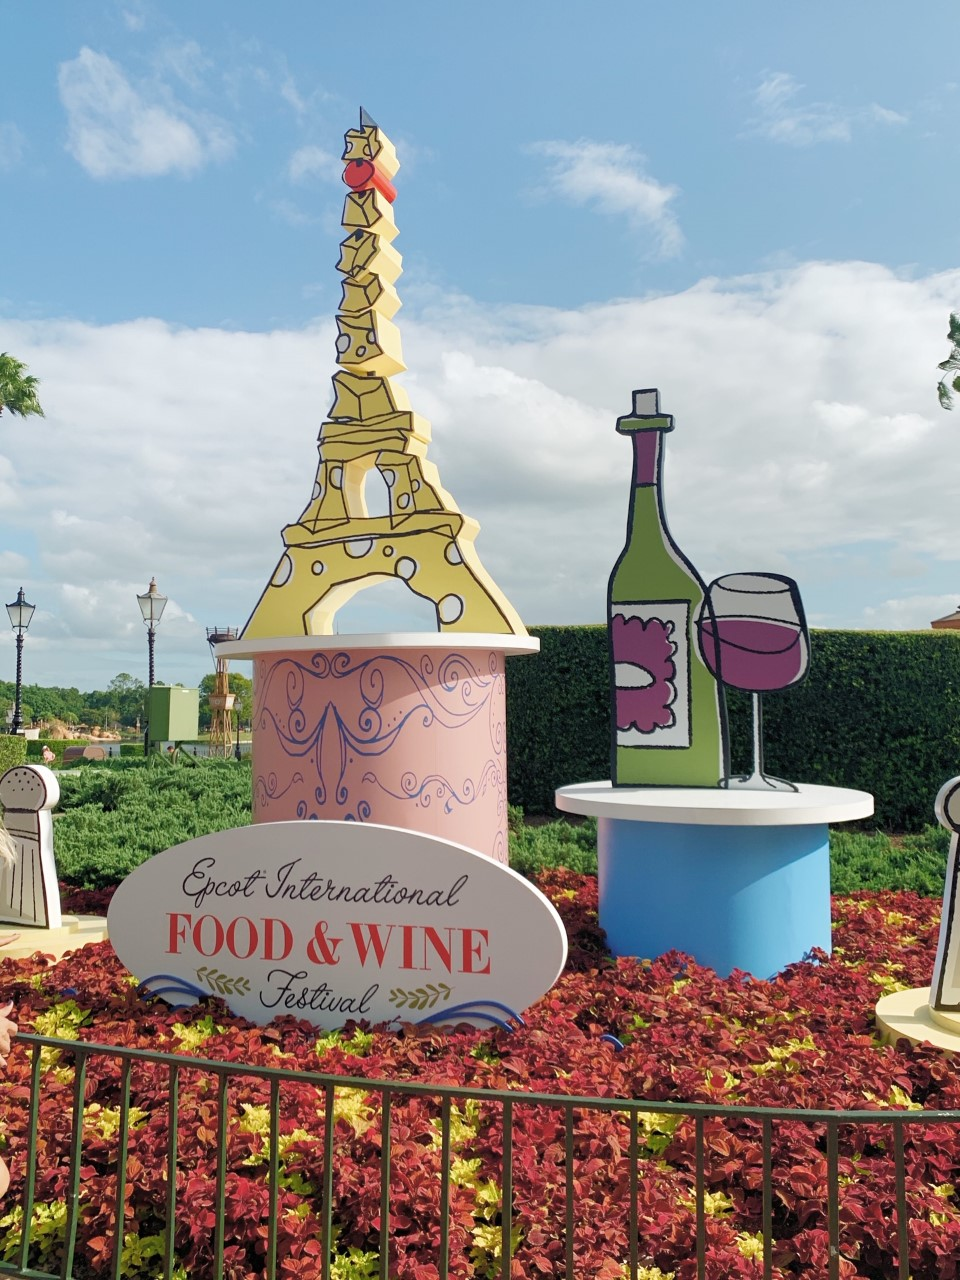 2019 Epcot International Food & Wine Festival